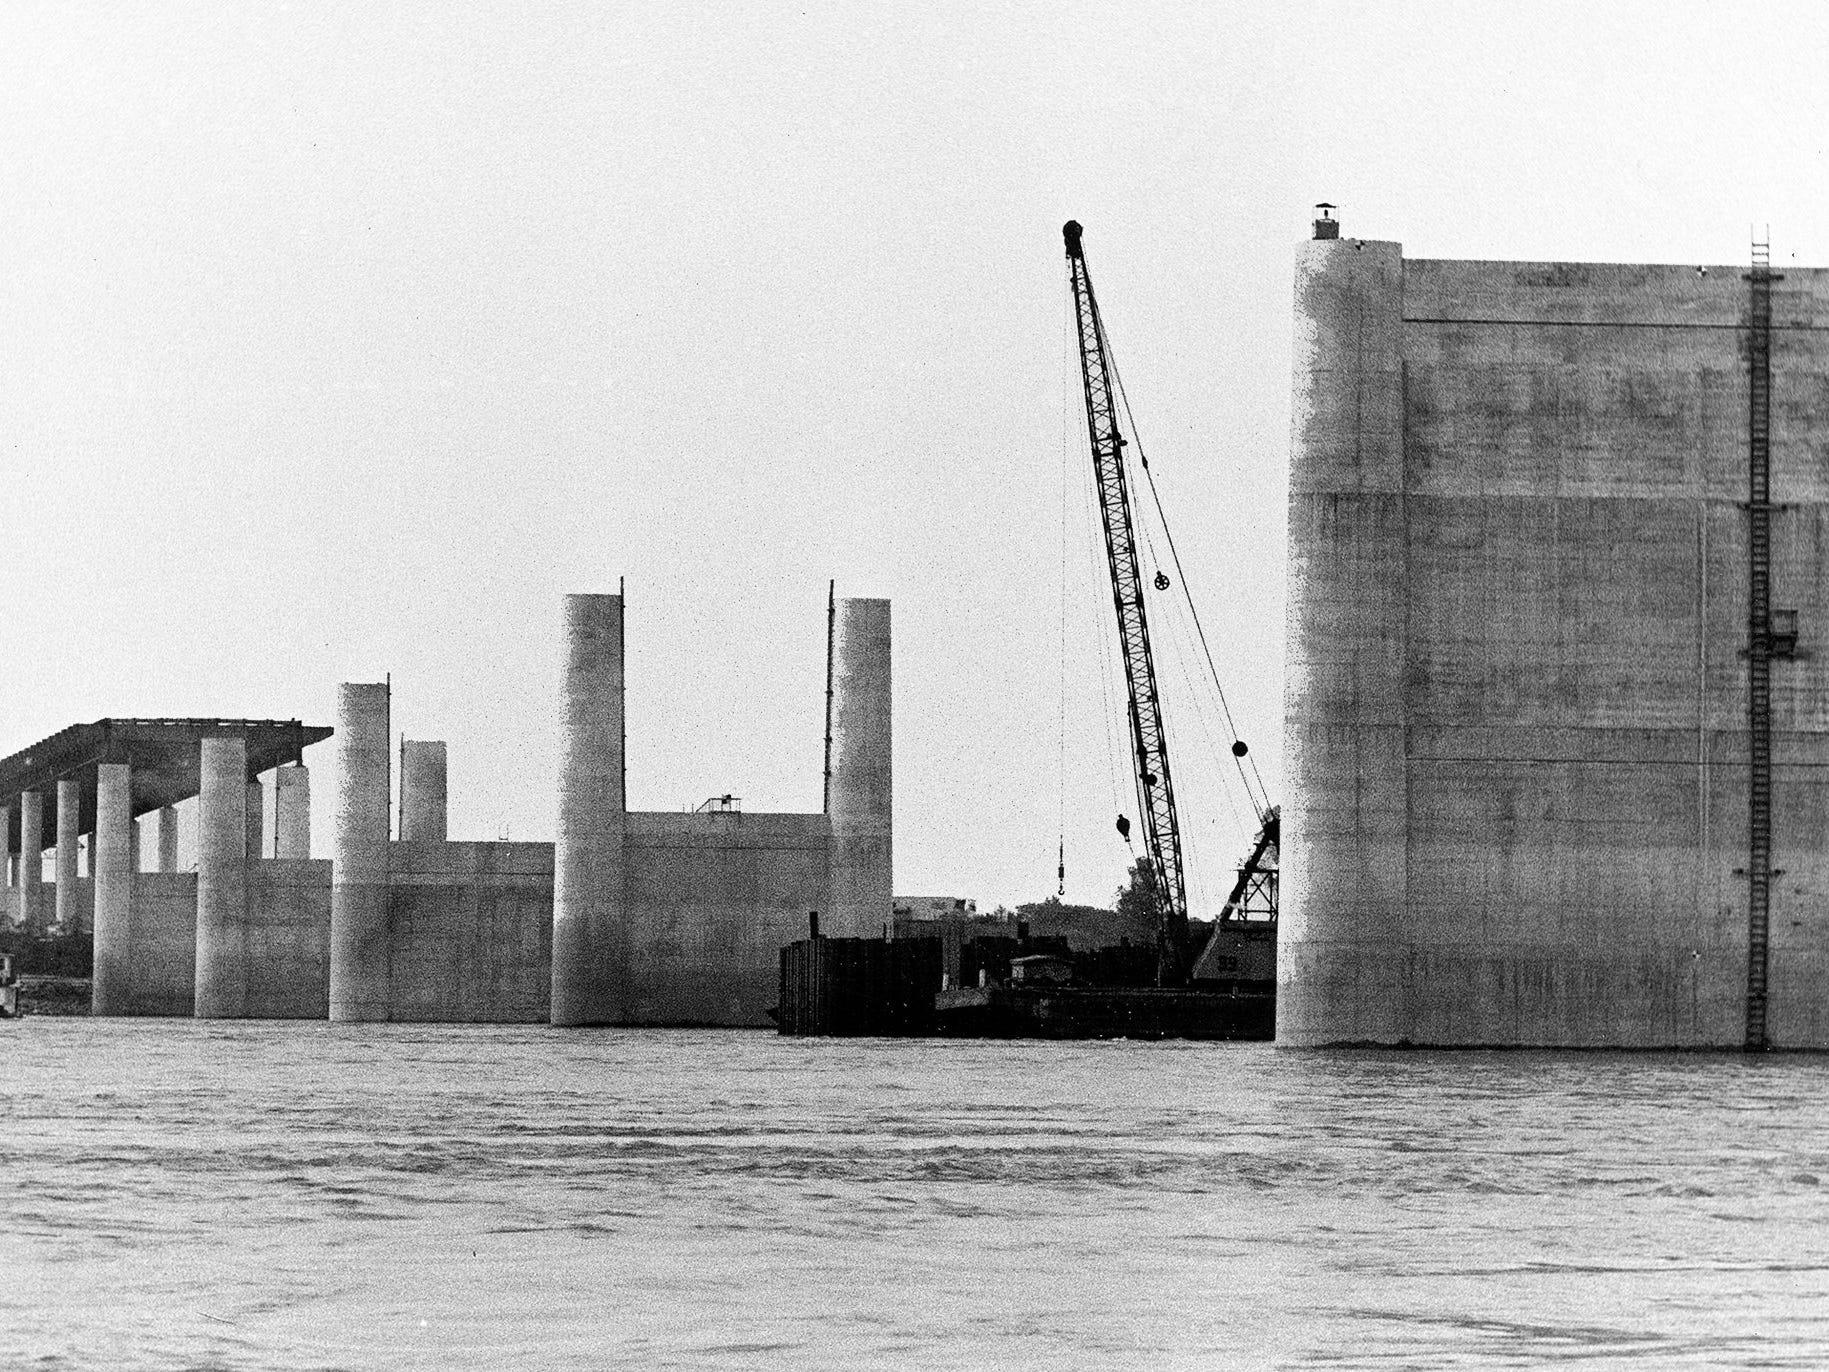 I-40 Bridge construction over the Mississippi River progresses on 1 Nov 1970.